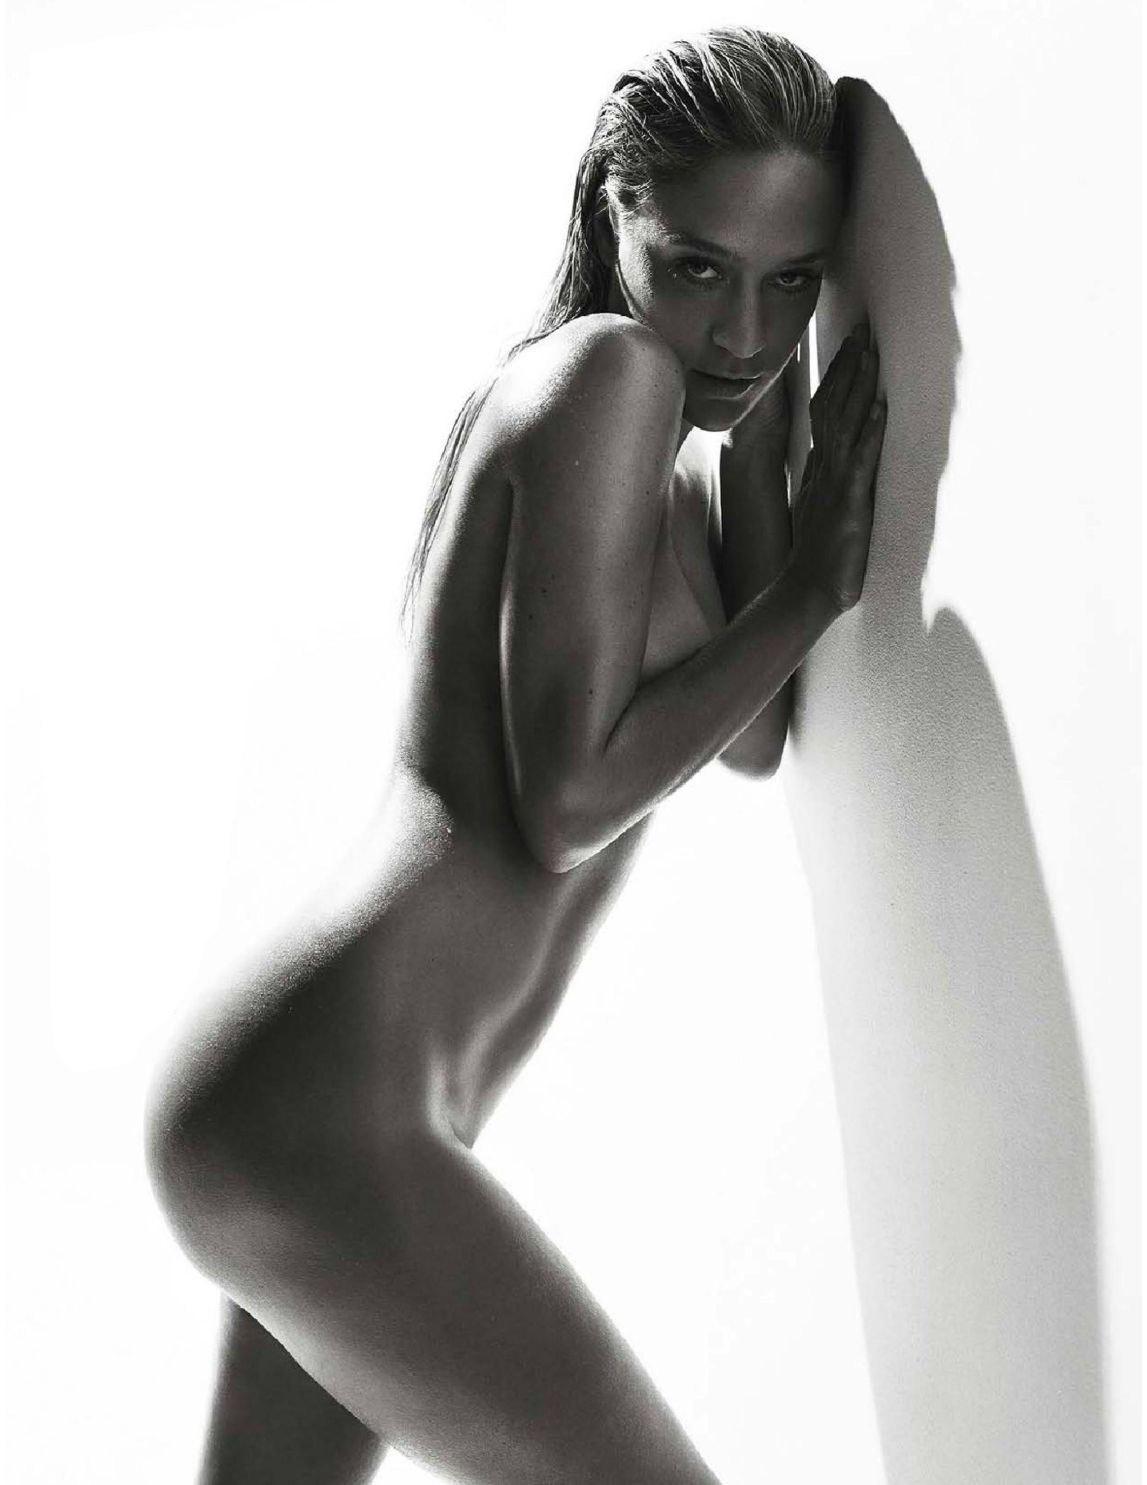 Chloe Sevigny nude by Michael Thompson. Chloe Sevigny by Michael Thompson: